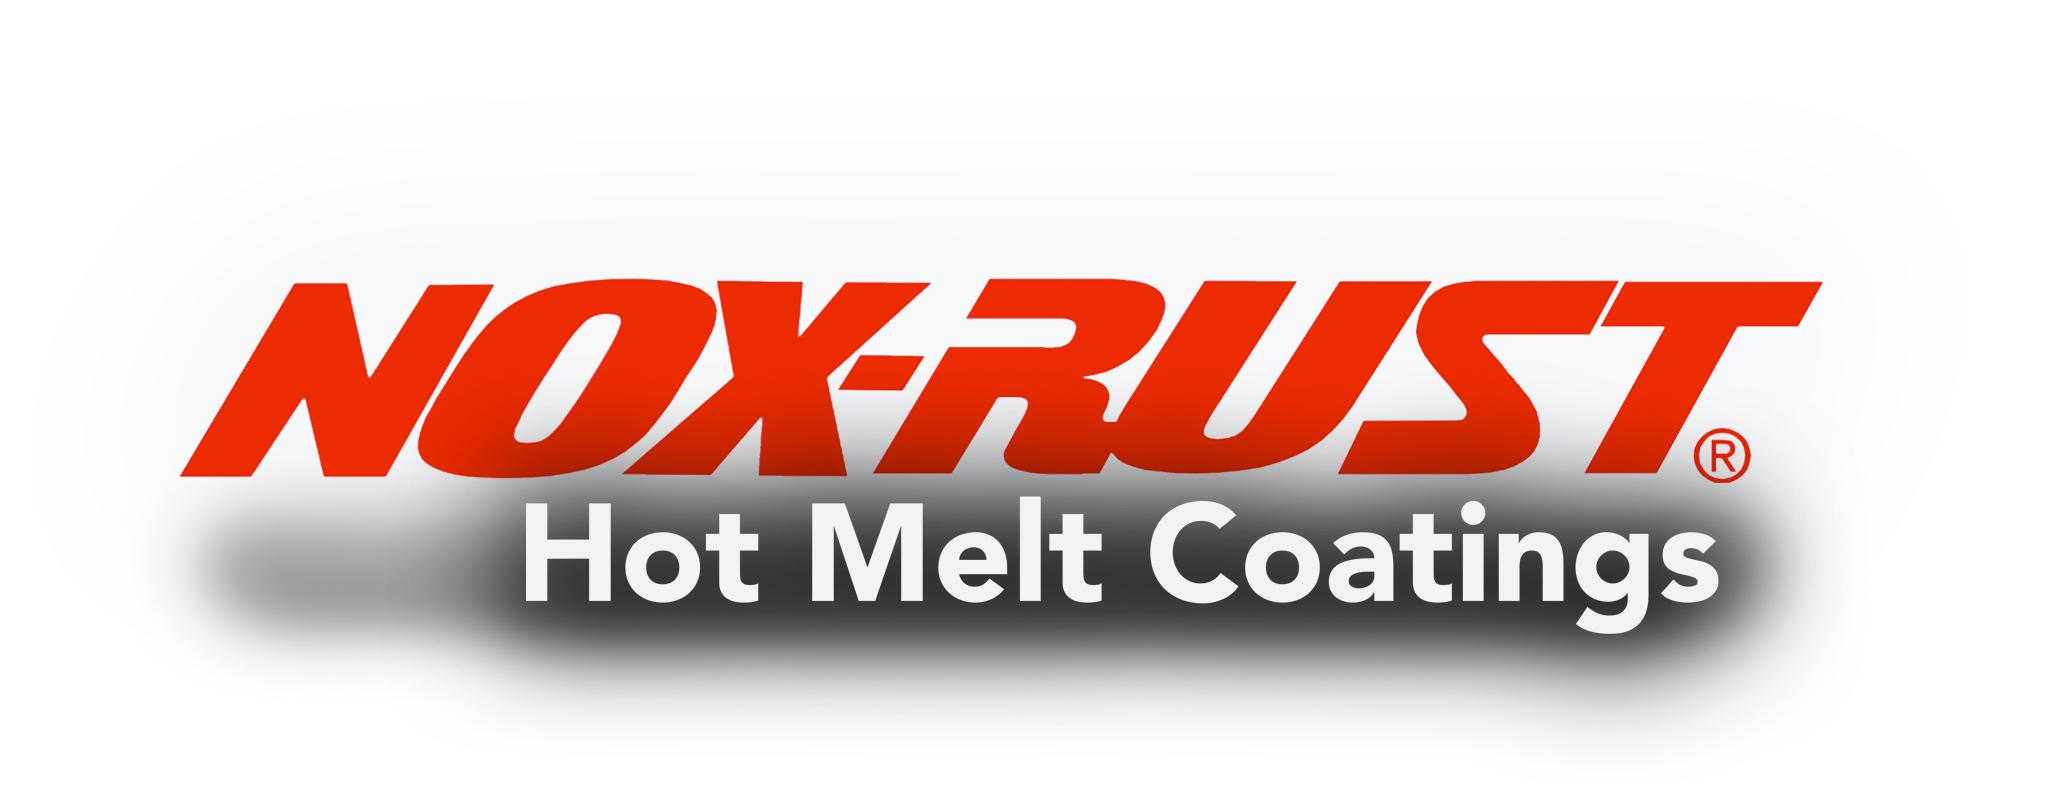 Sae World Congress >> Daubert Chemical's Next-Generation Nox-Rust 1290HP Uses Nanoscale Chemistry to Boost Rust ...